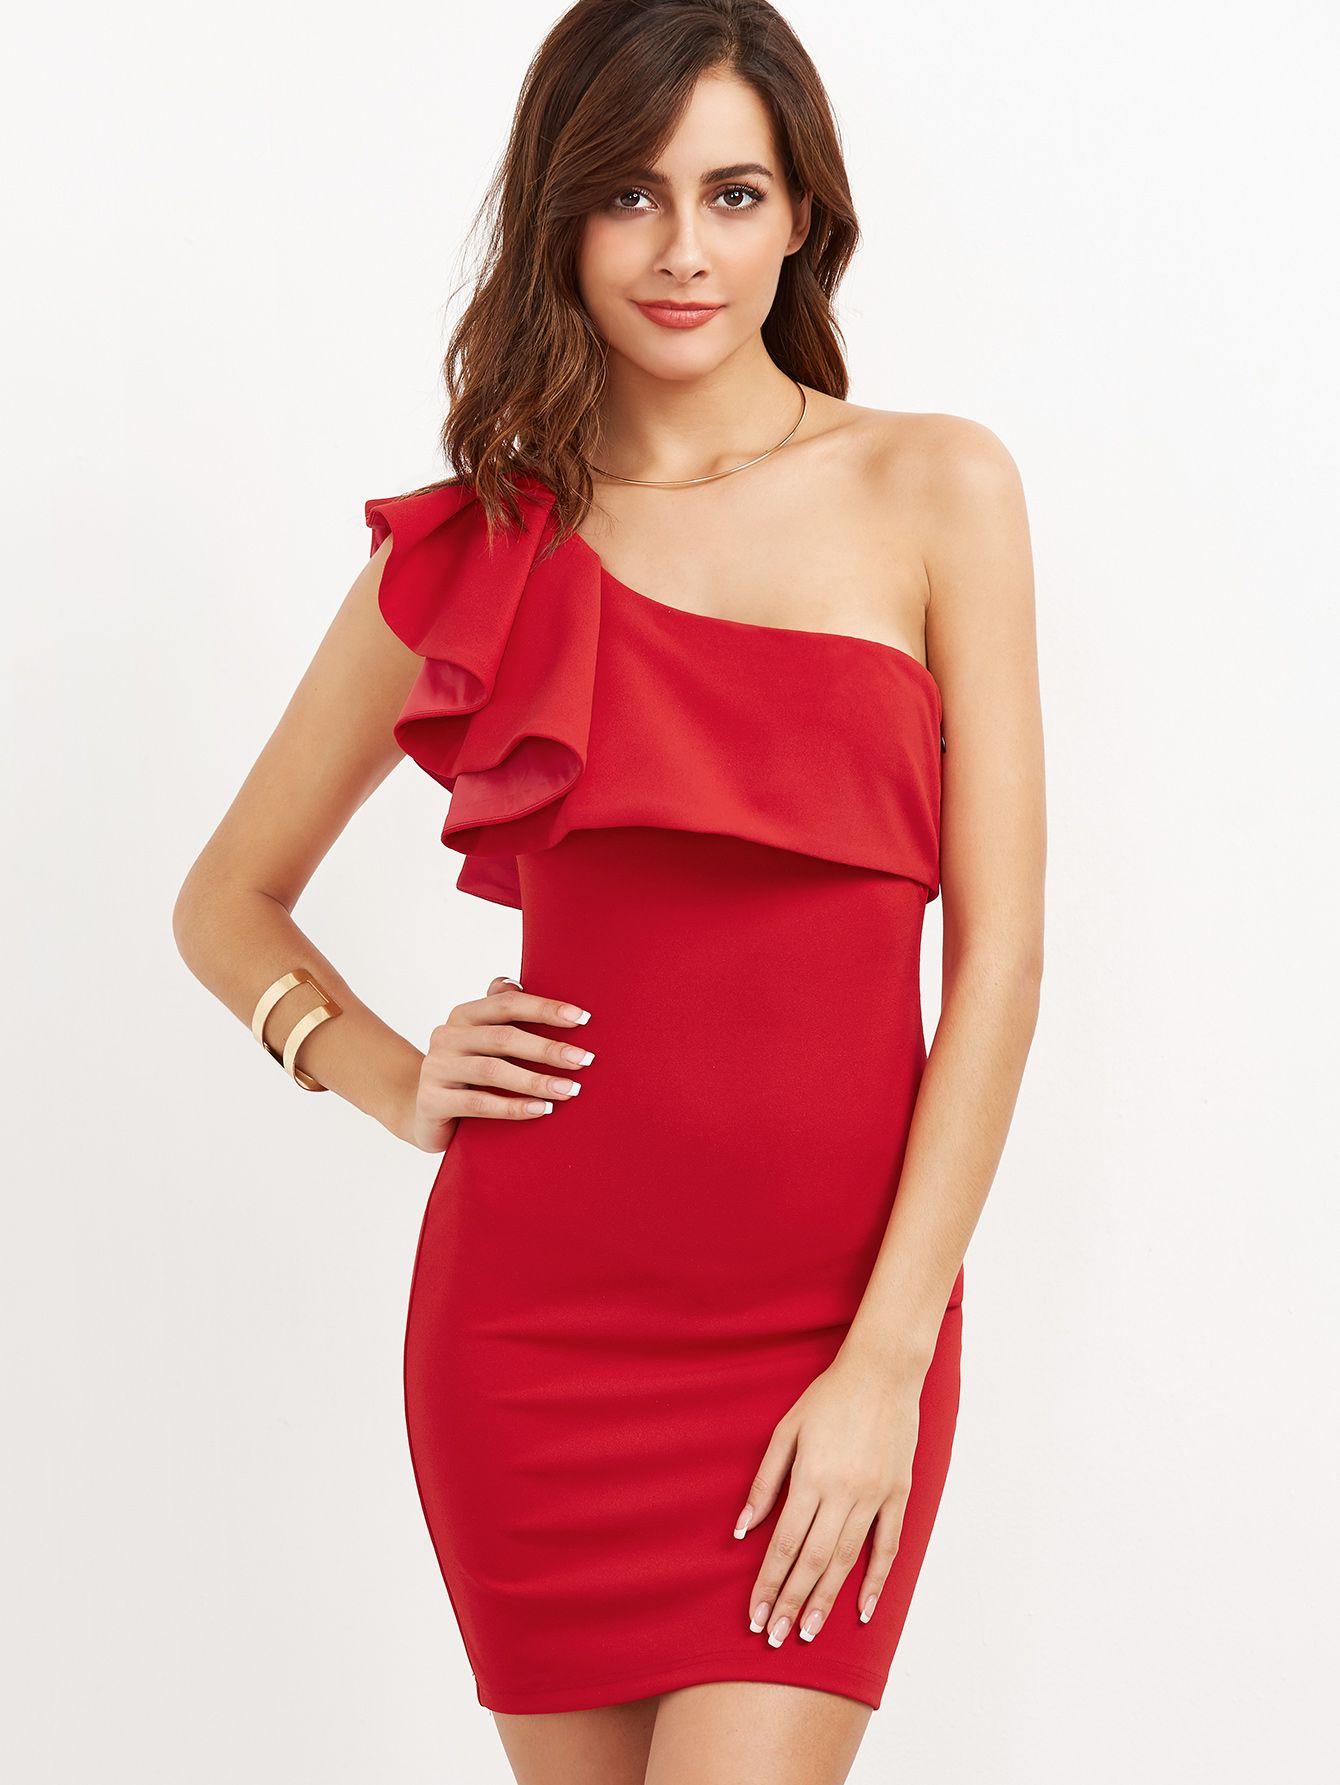 Park Art|My WordPress Blog_Red Ruffle Dress Long Sleeve